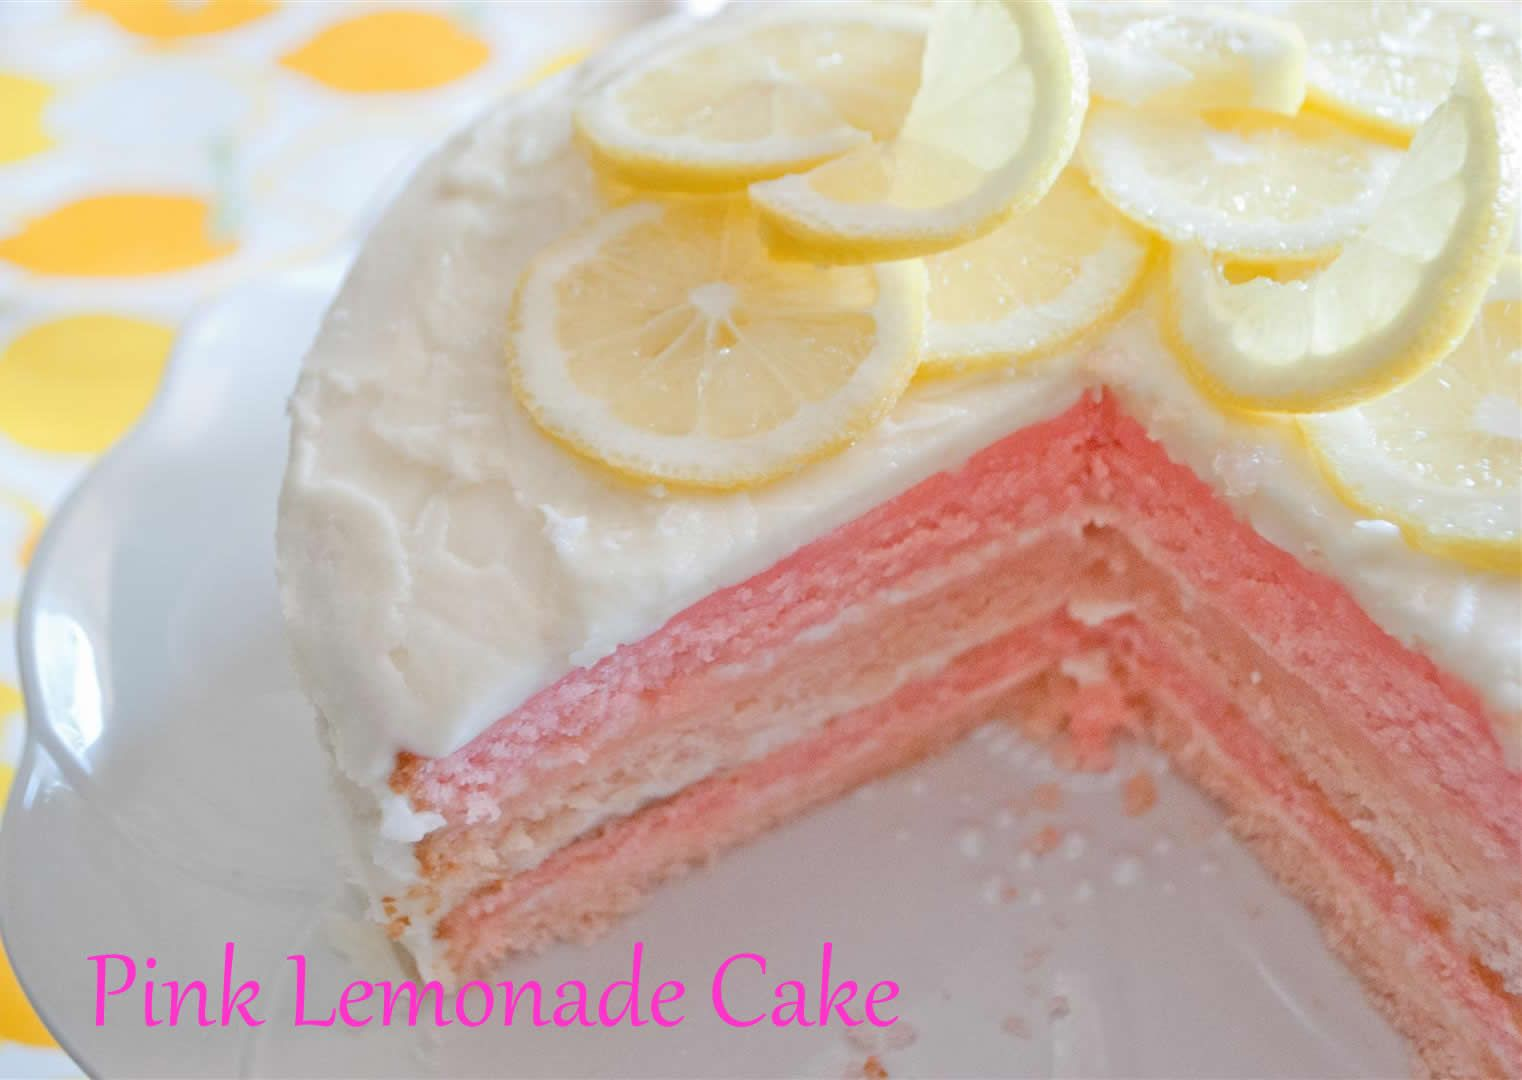 Pink Lemonade Cakes Presentation Mynextcar